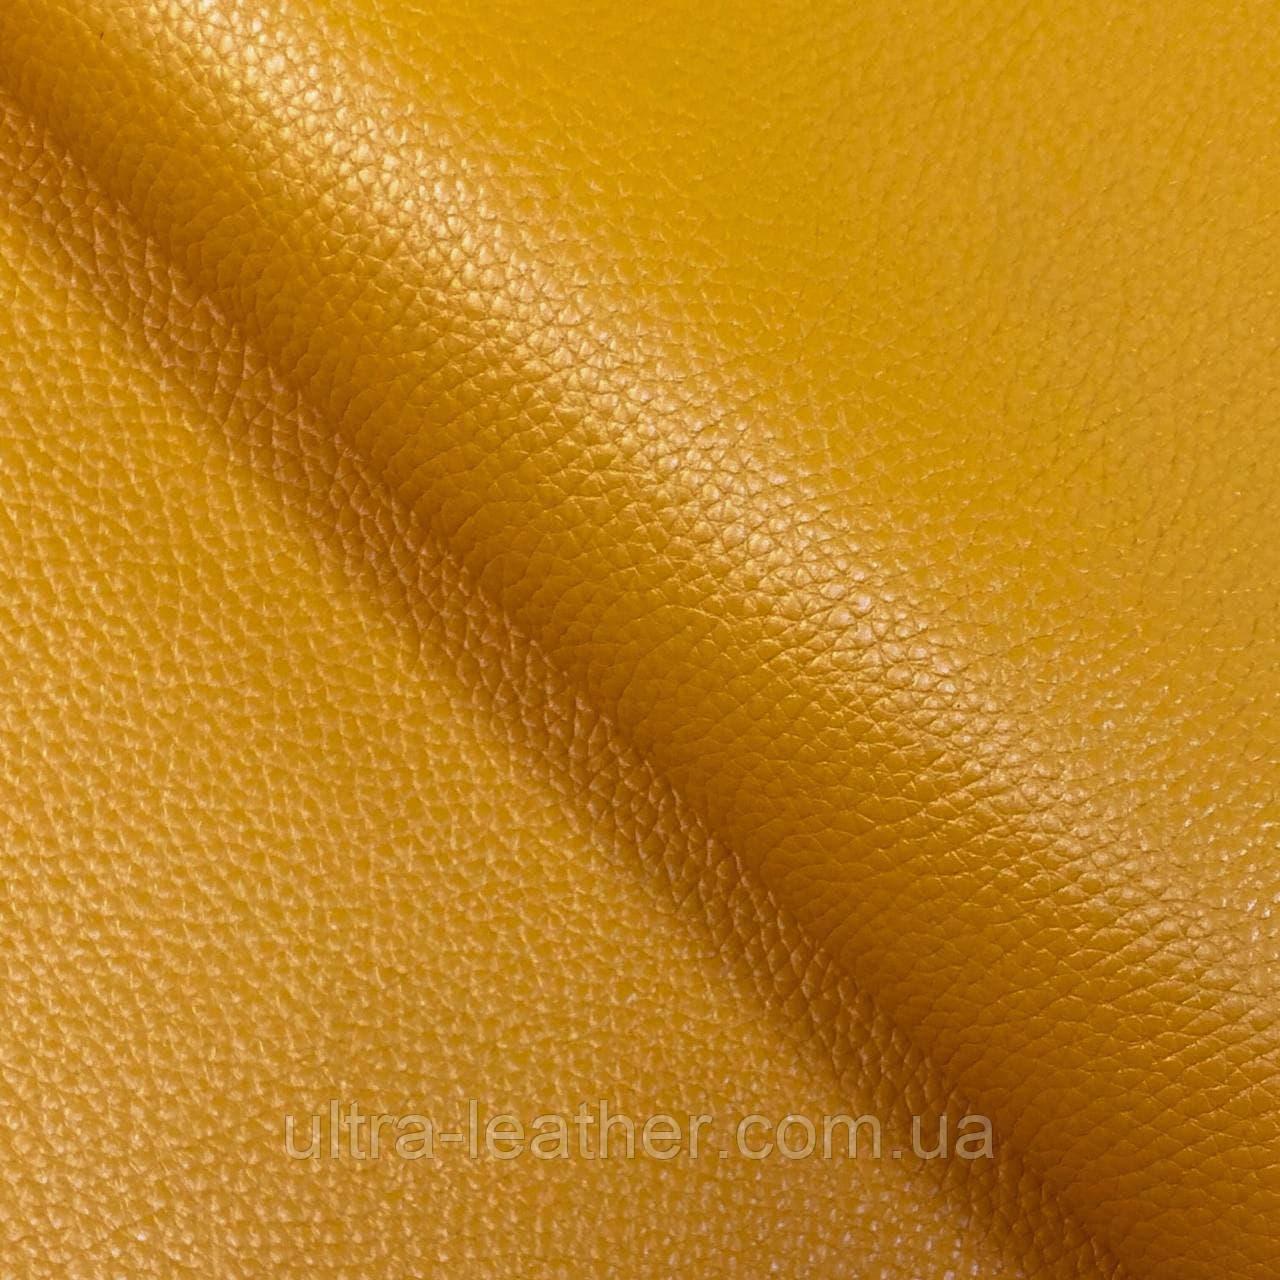 Натуральна шкіра галантерейна ФЛЕШ, Манго, Pantone 15-1049